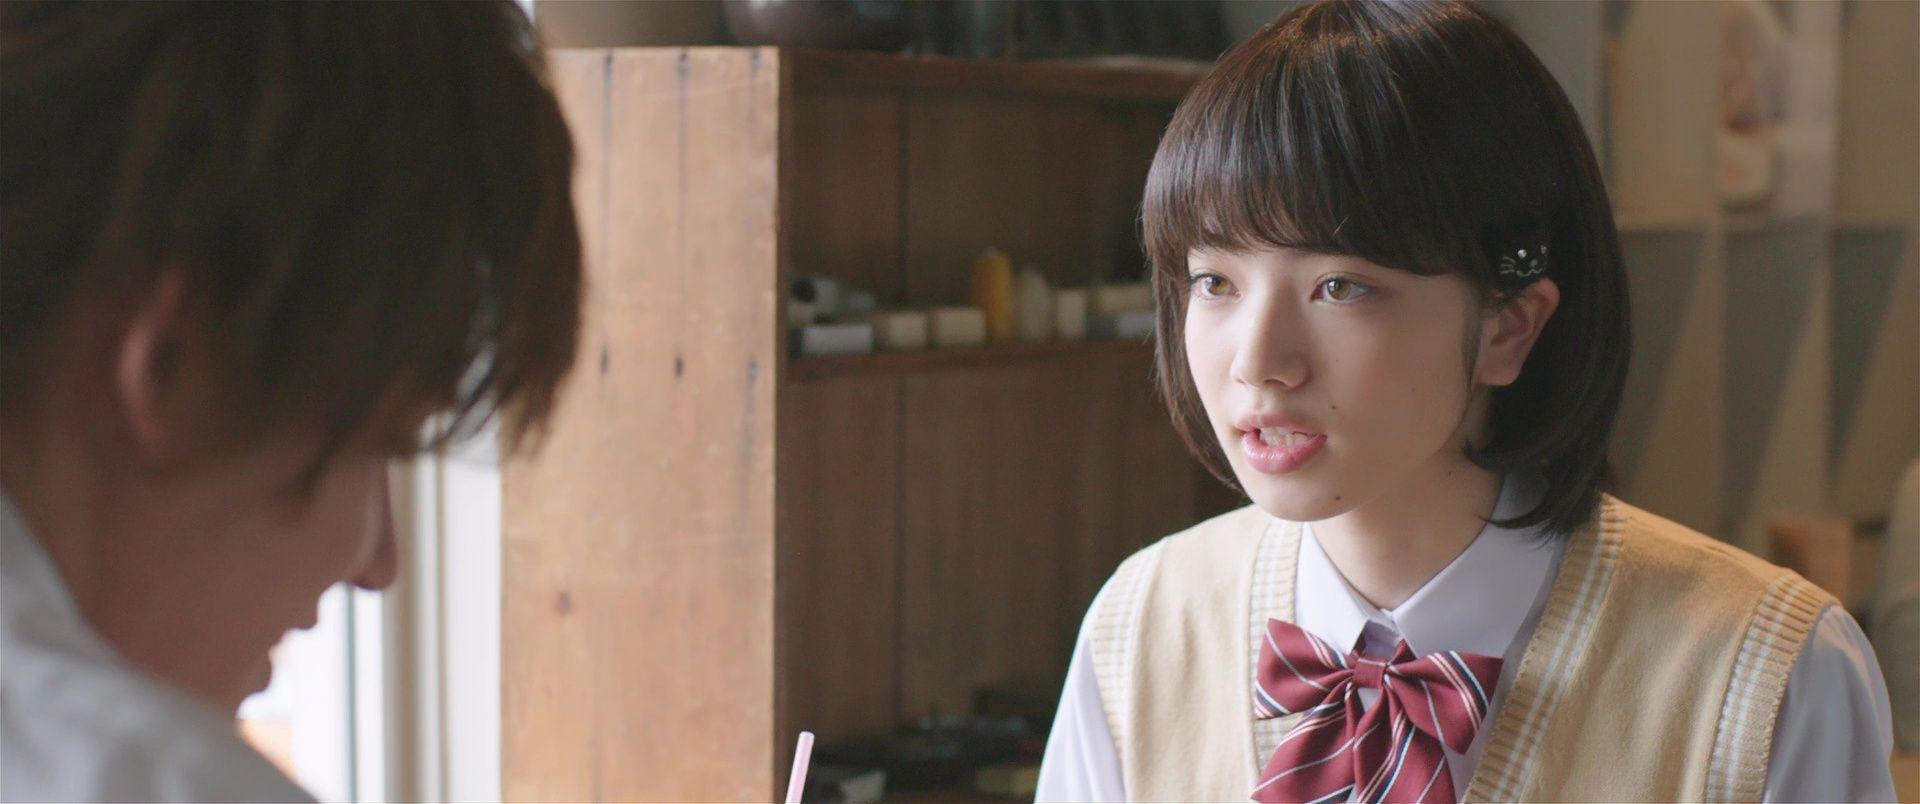 a short distance relationship nana komatsu and her boyfriend